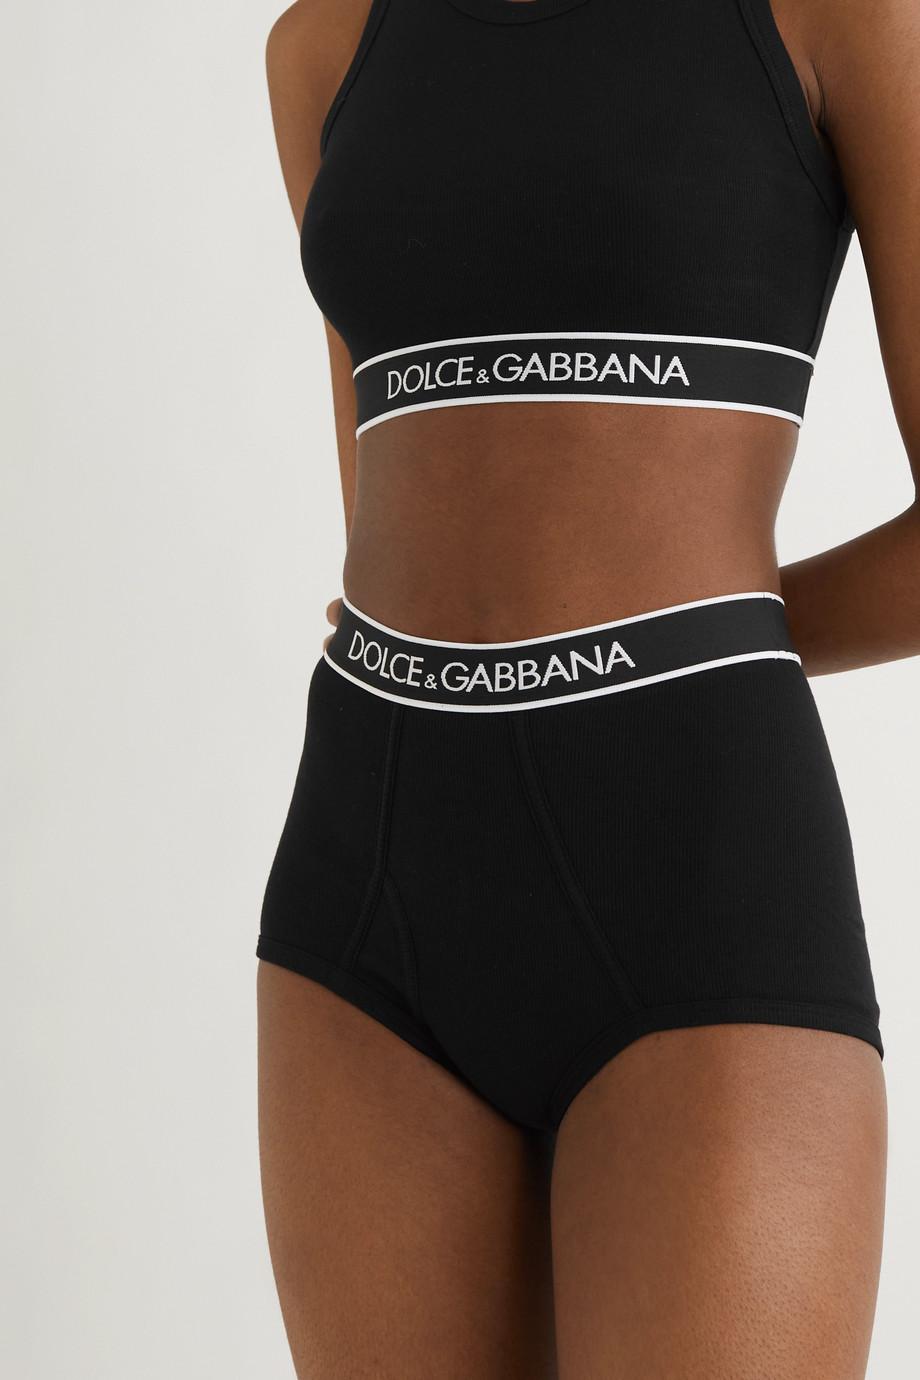 Dolce & Gabbana Ribbed stretch-cotton jersey briefs